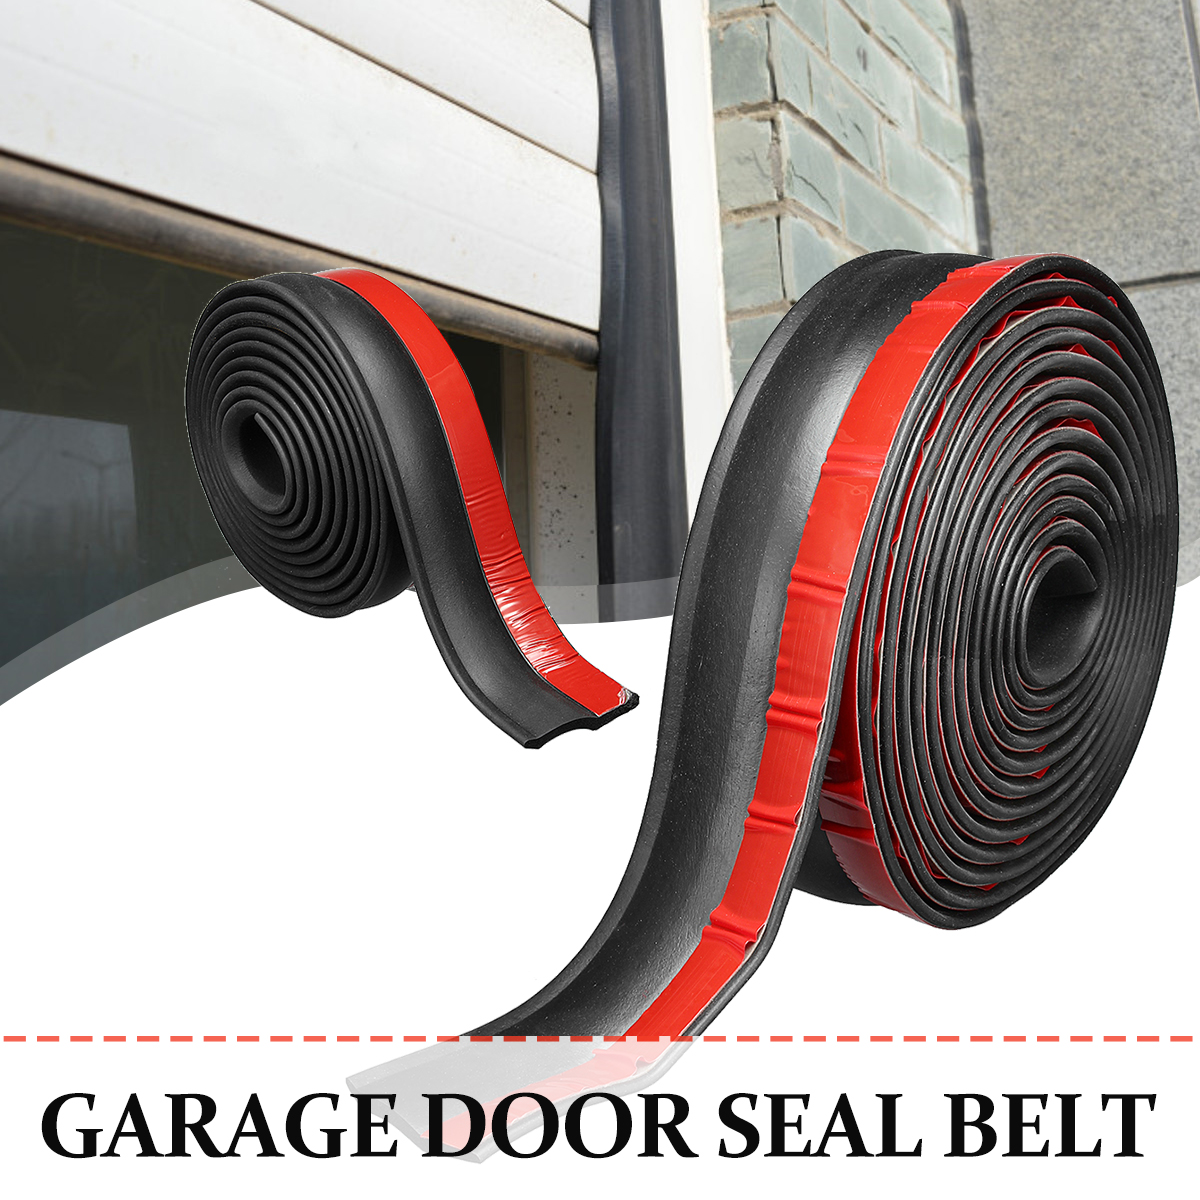 3 5 5 5m Garasi Door Bottom Seal Cuaca Stripping Karet Seal Strip Pintu Listrik Bawah Air Asap Kebisingan Seal Bumper Strip Gasket Aliexpress